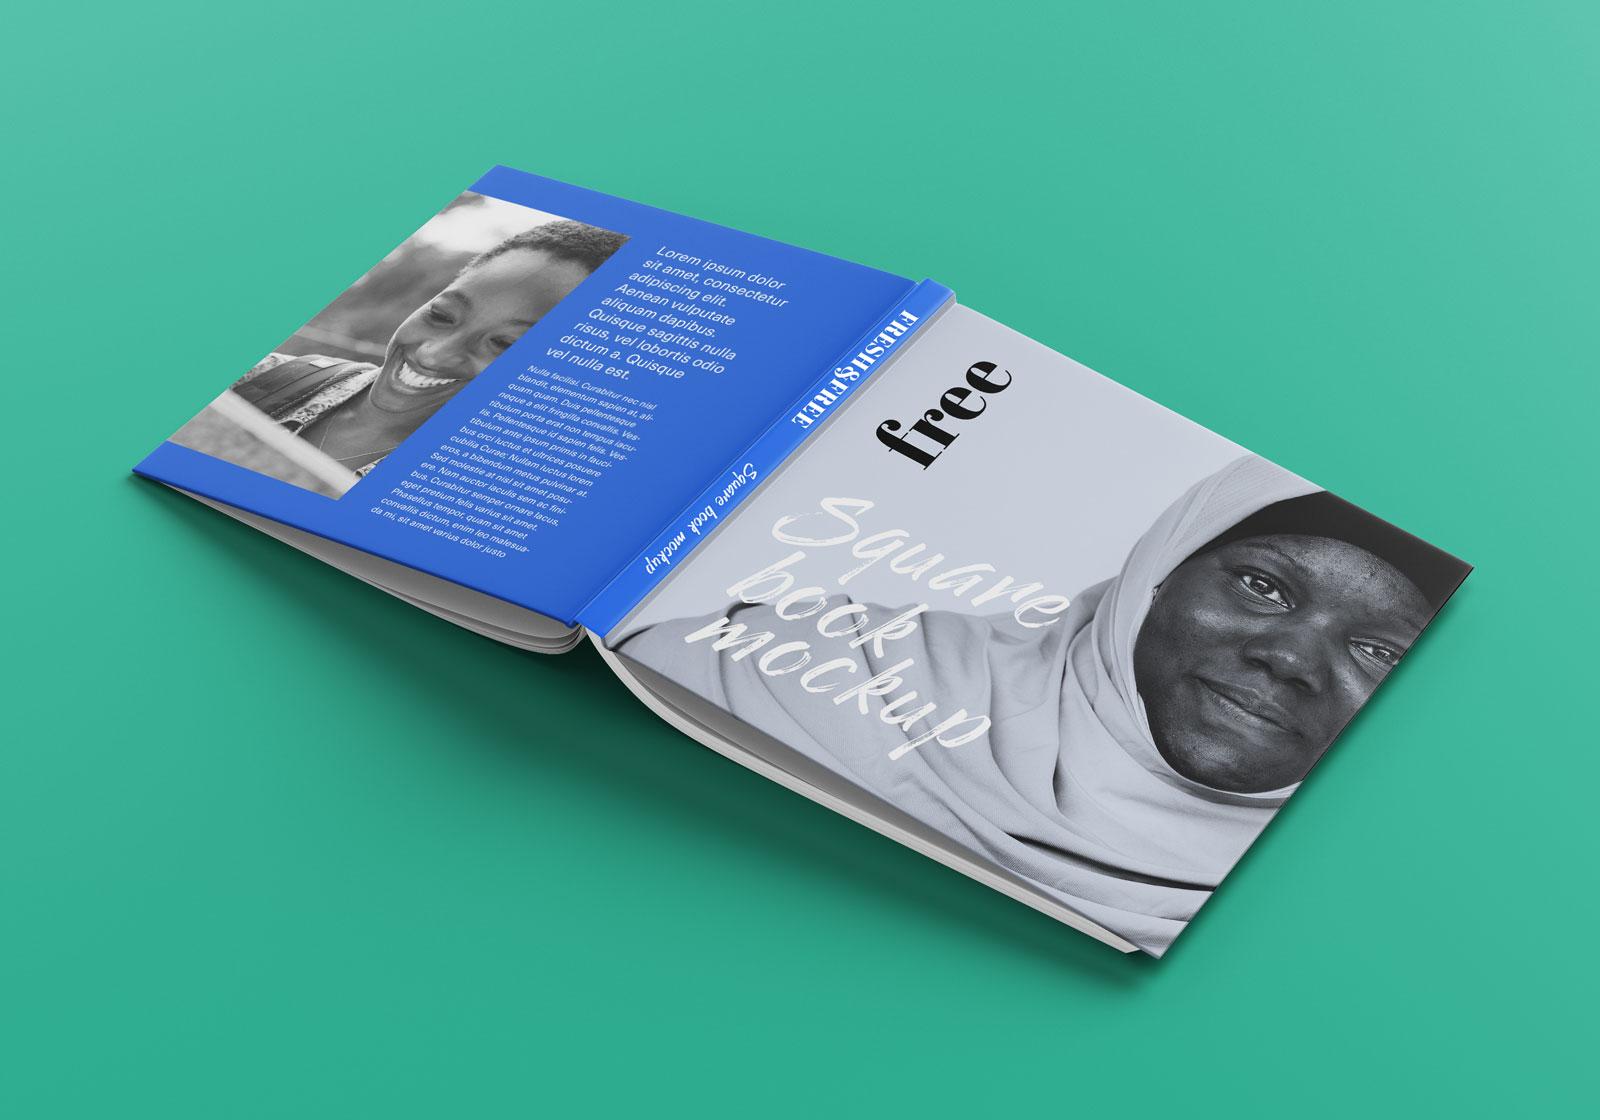 Free-Premium-Square-Magazine-Mockup-PSD-2